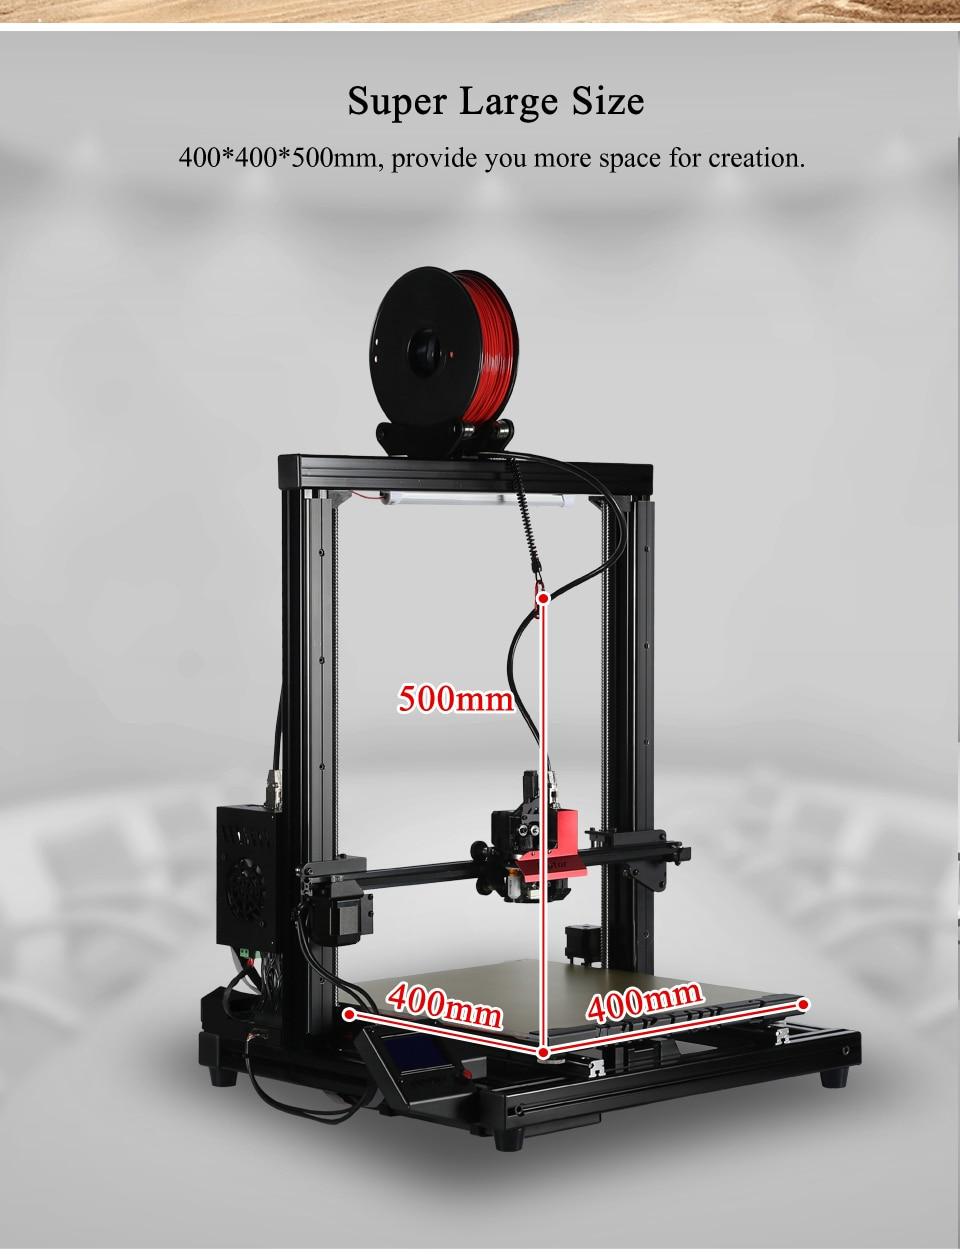 VIVEDINO Raptor 2.0 Big 3D Printer